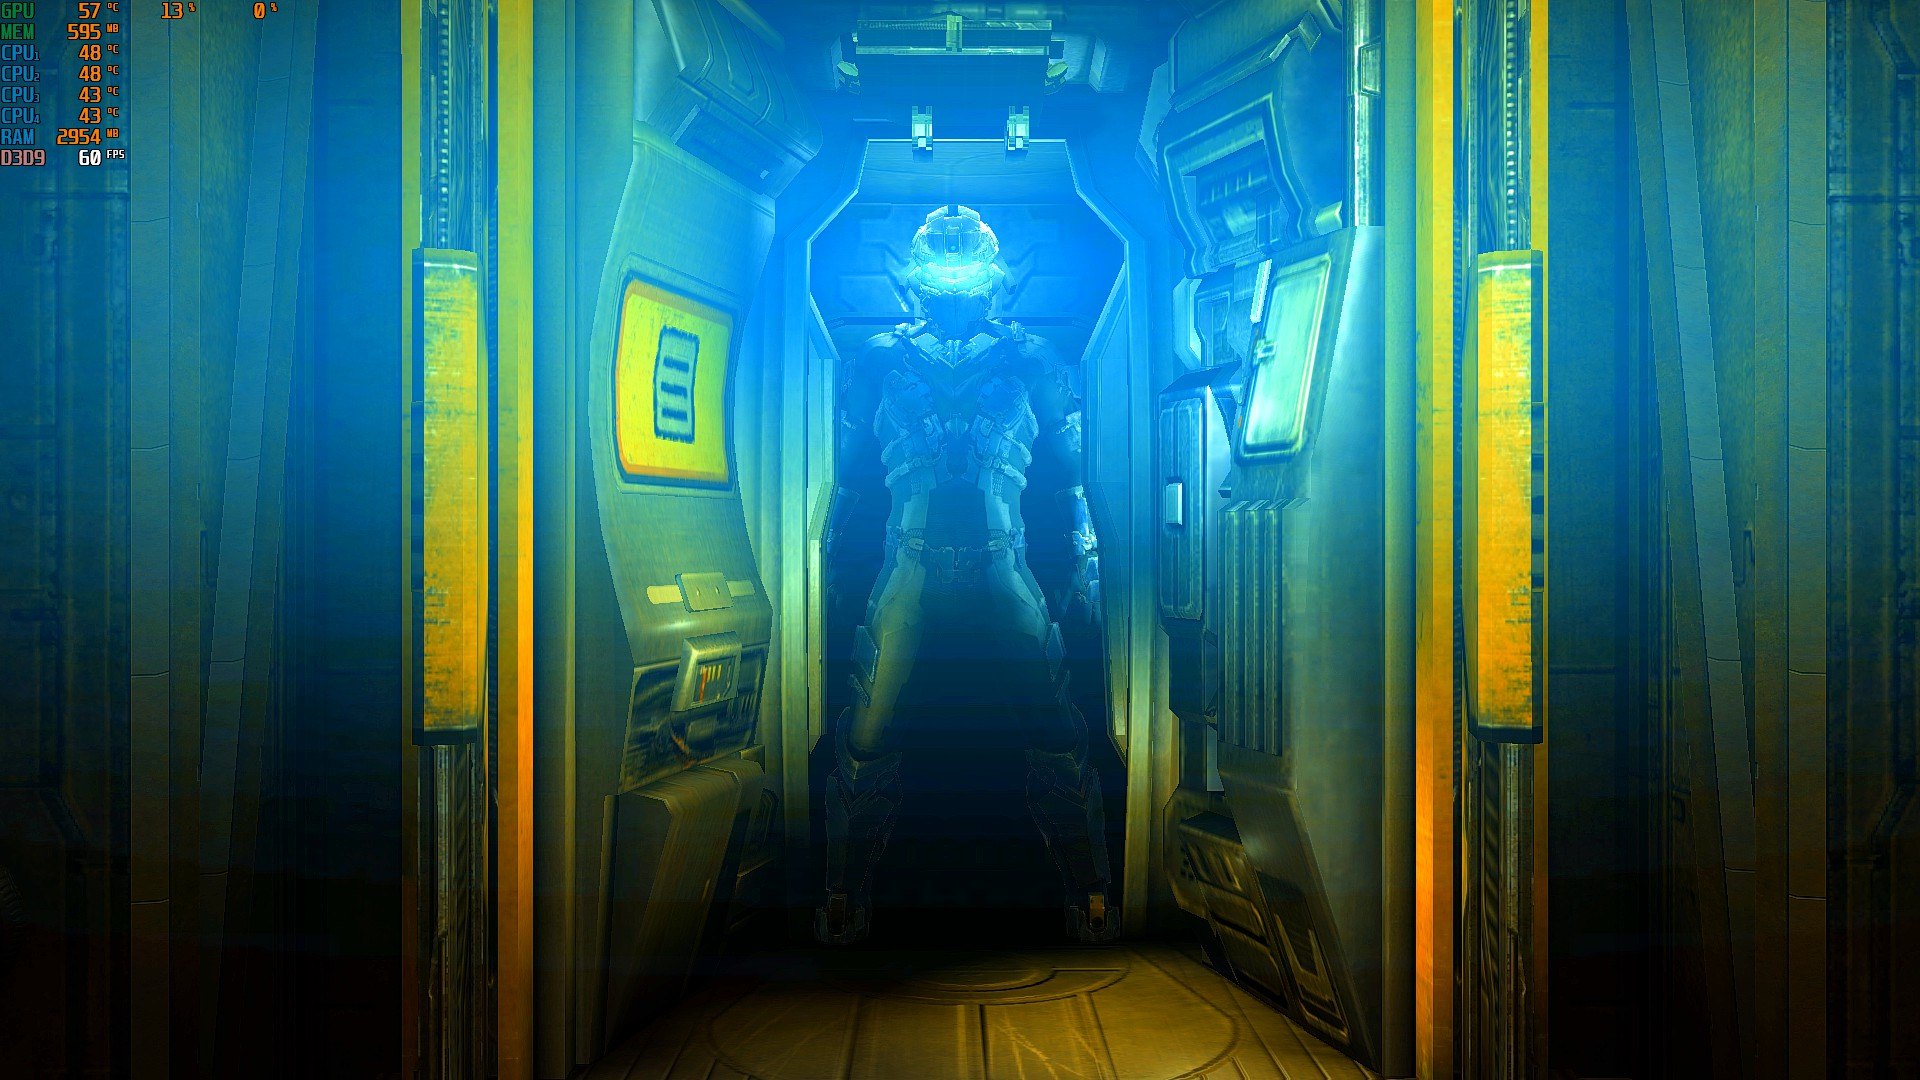 000182.Jpg - Dead Space 2